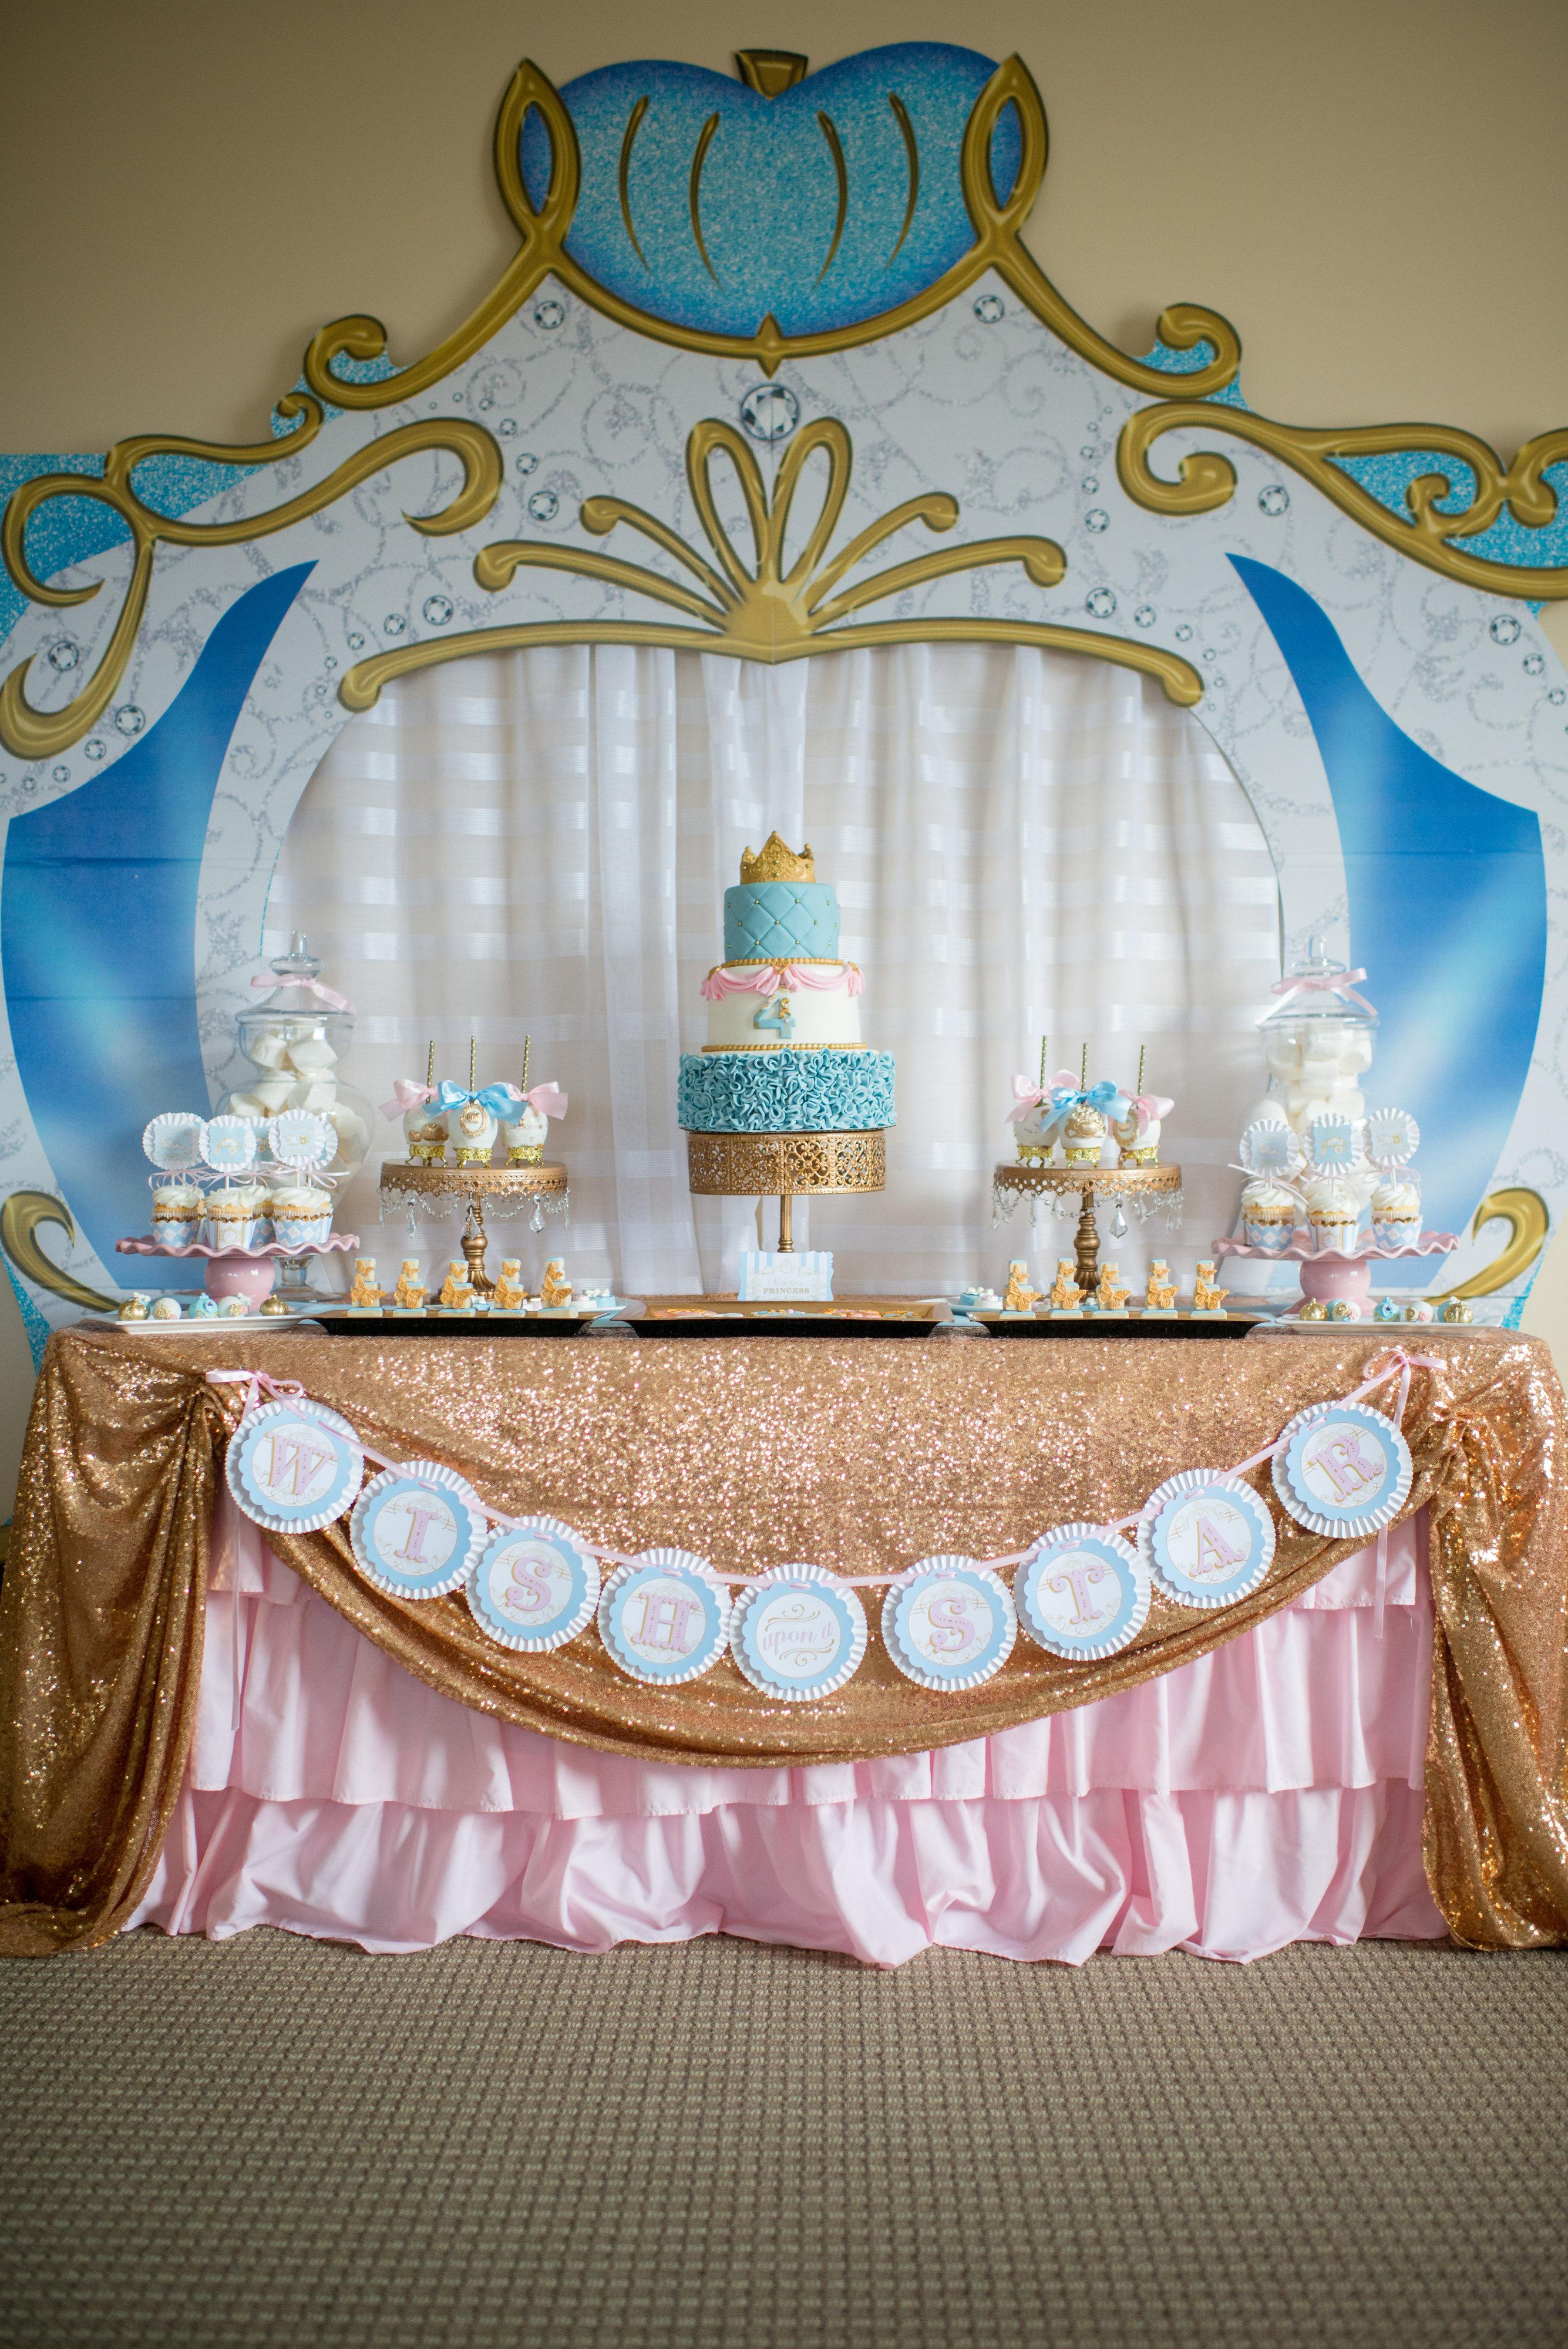 A Dream Come True Cinderella Birthday Party Hoopla